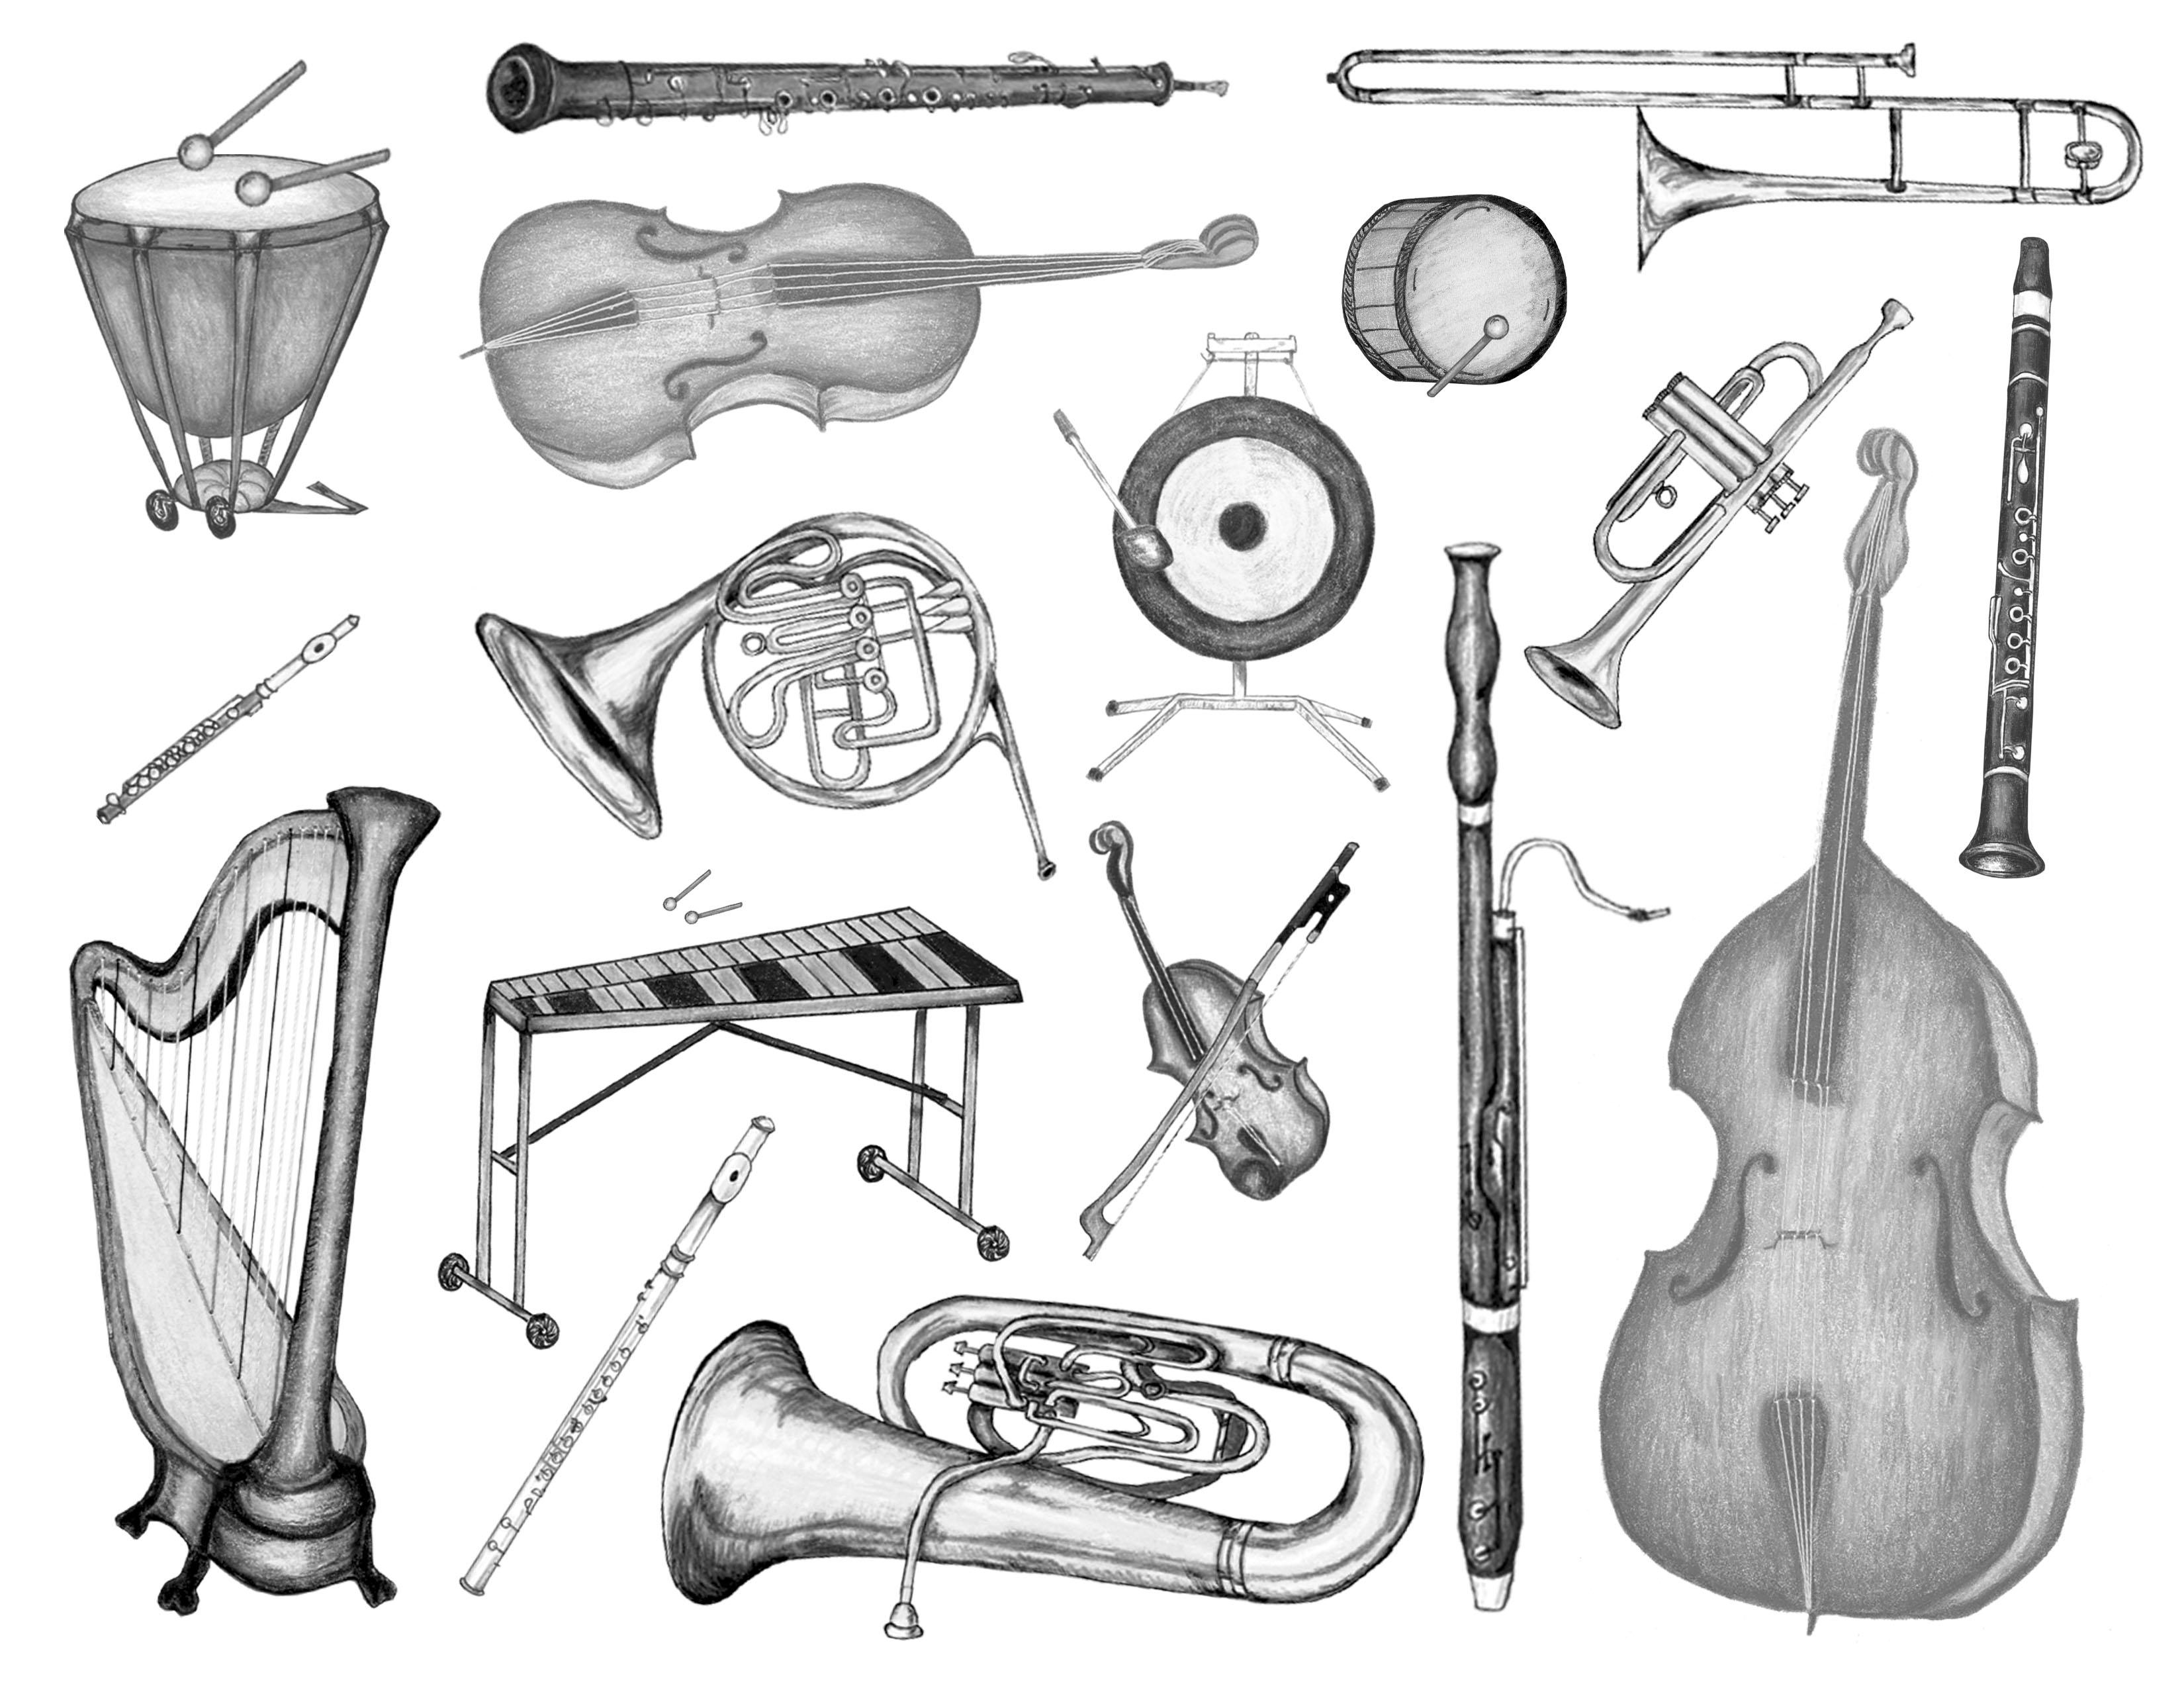 Drawn instrument orchestra music Tammy Bronson instruments Click Carter